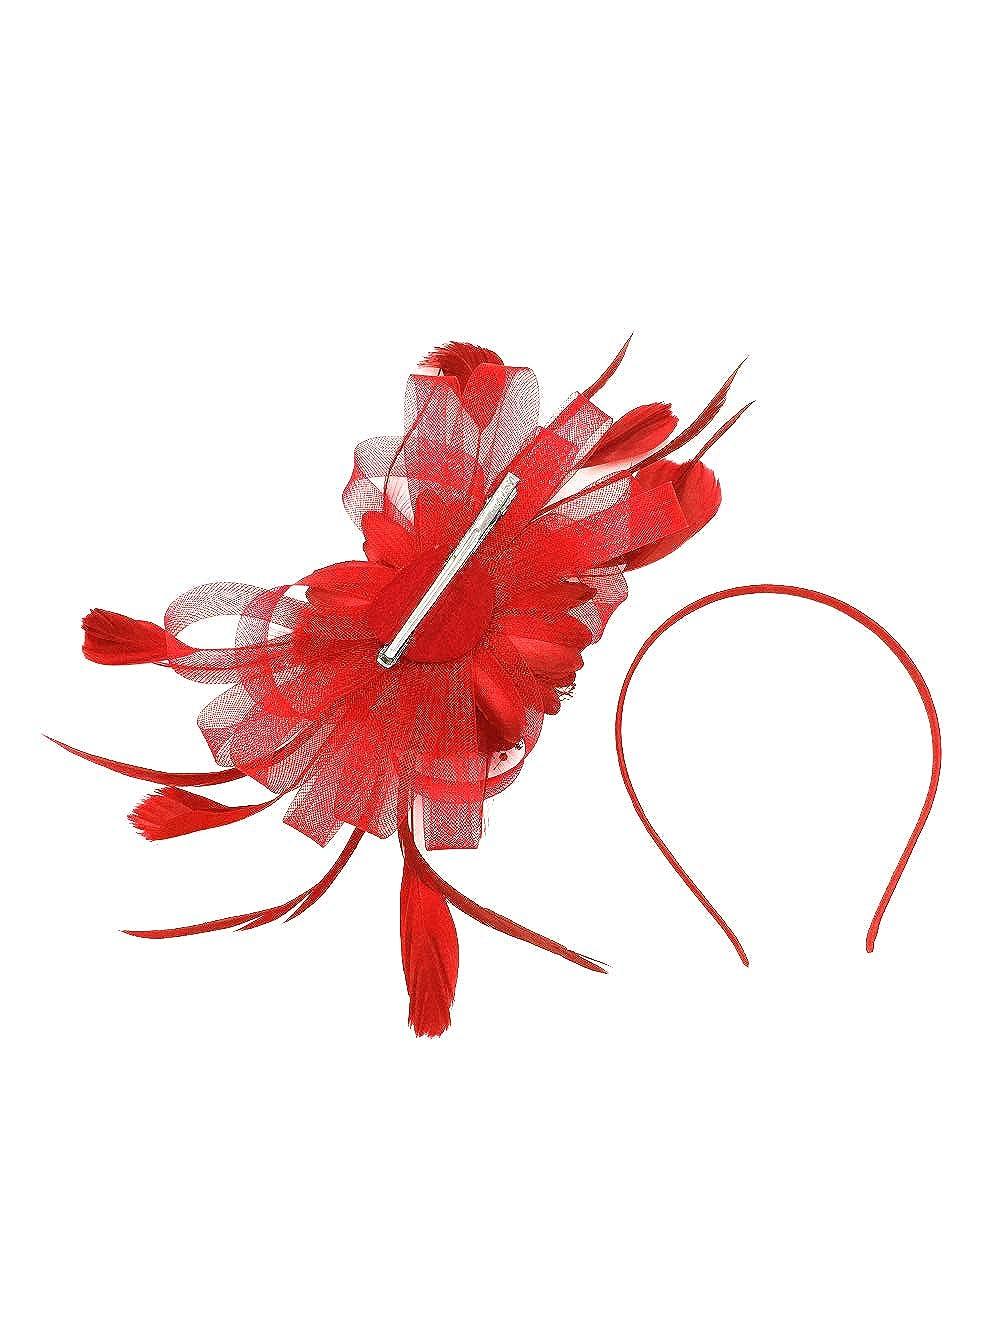 Feather Ribbon Kentucky Derby Fascinators,Flowers 20S Hats For Women Tea Party